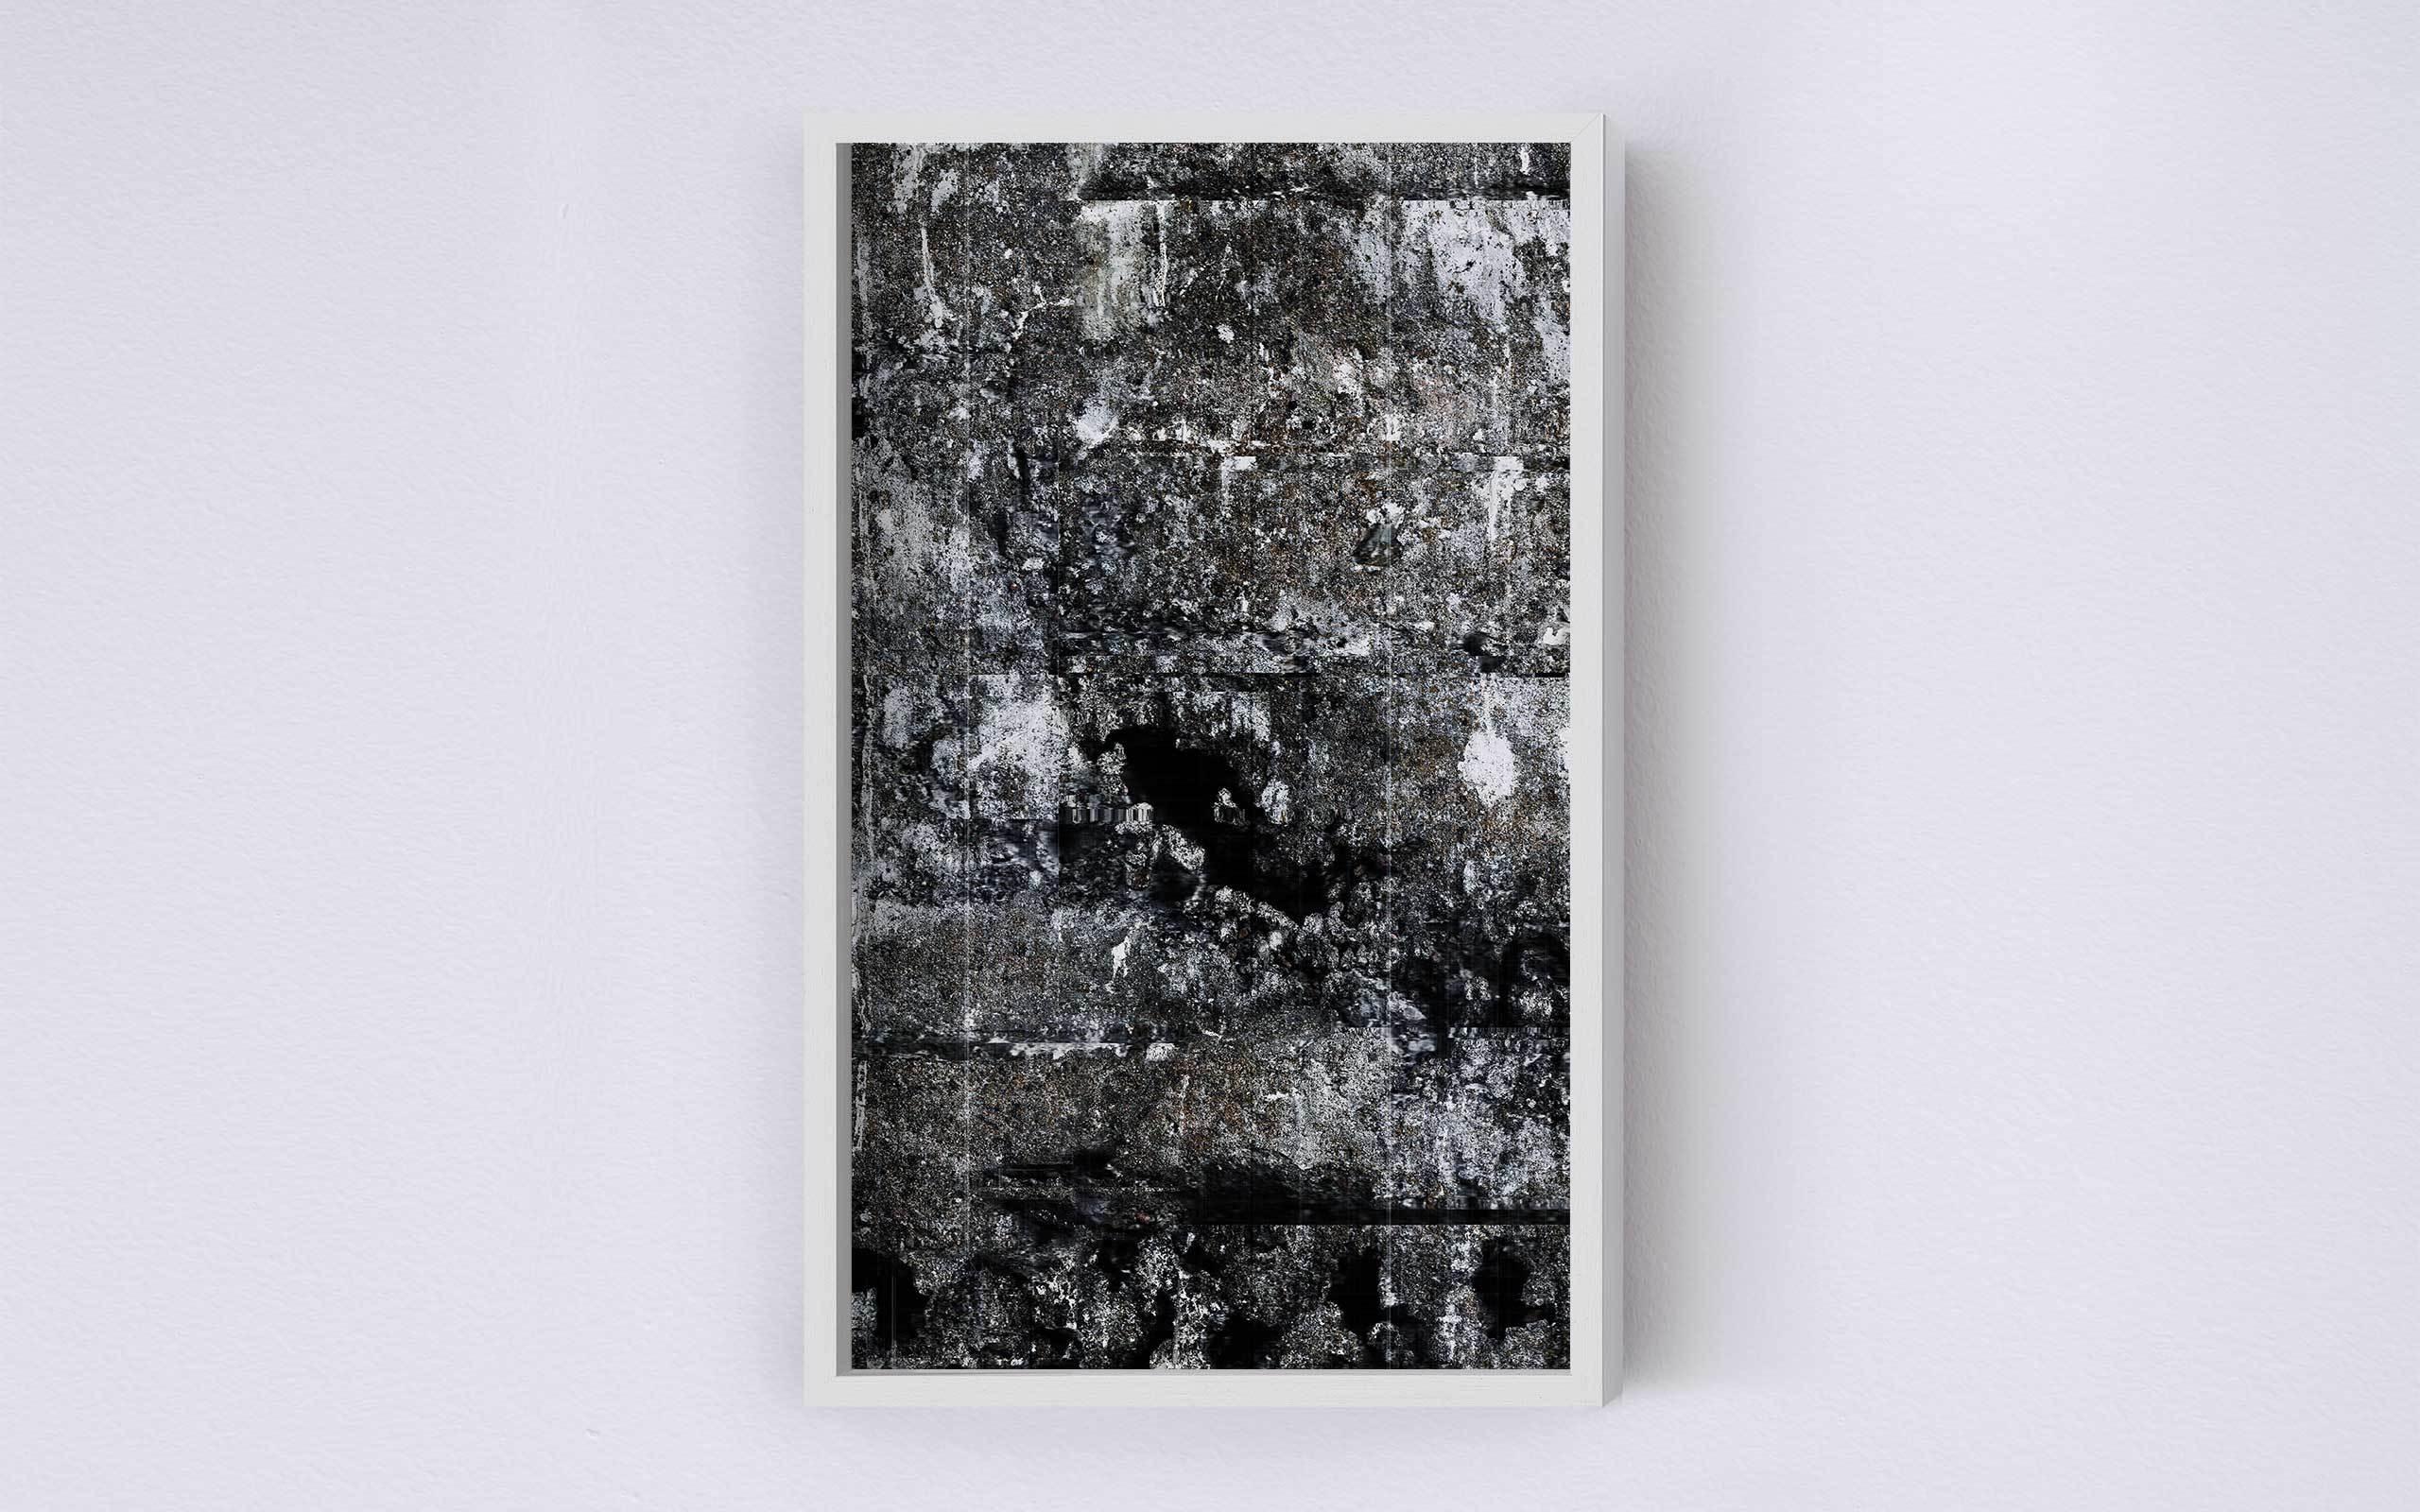 06 Jskoog John Skoog limited-release art edition (Rift 1) South Wall